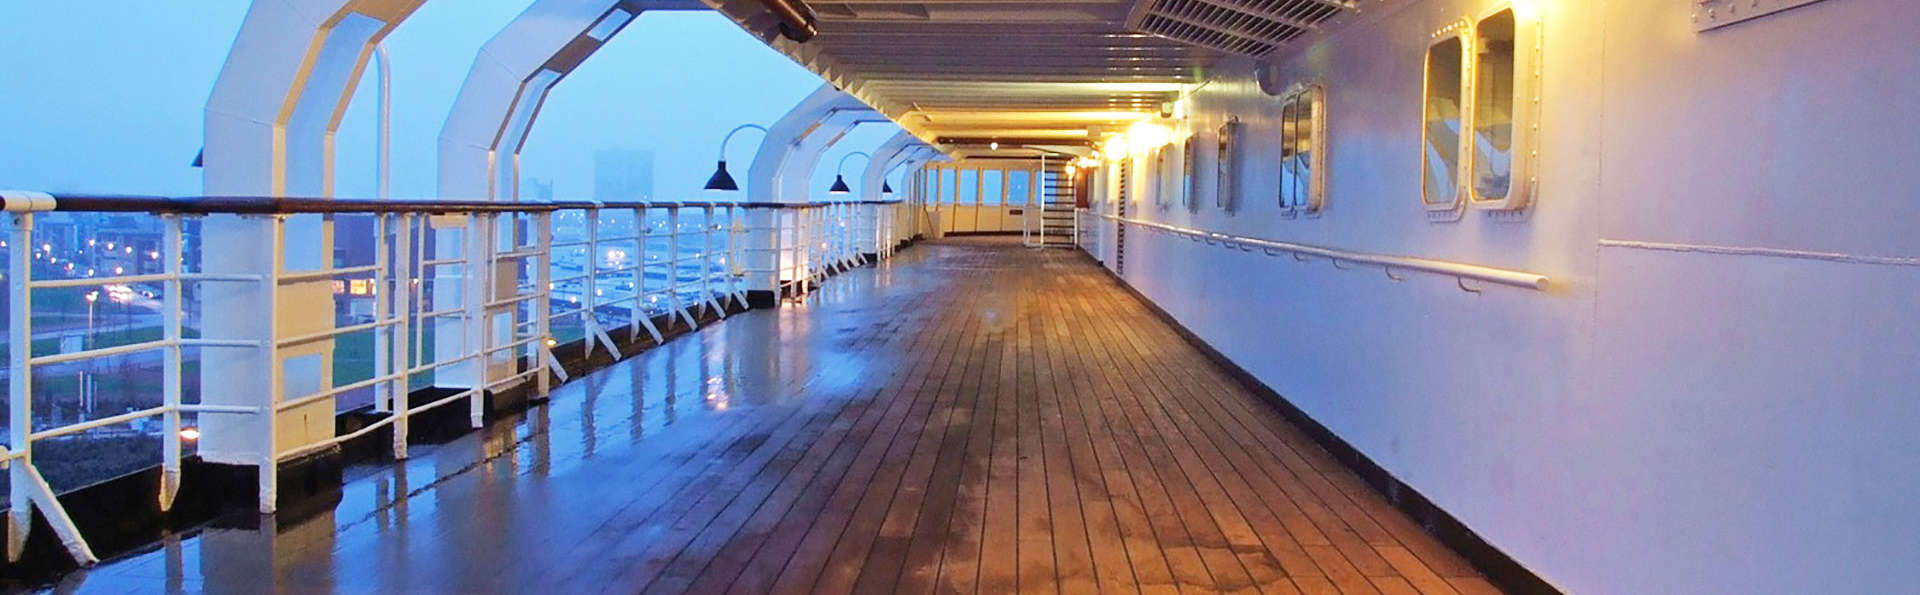 ss Rotterdam Hotel and Restaurants - EDIT_boat.jpg